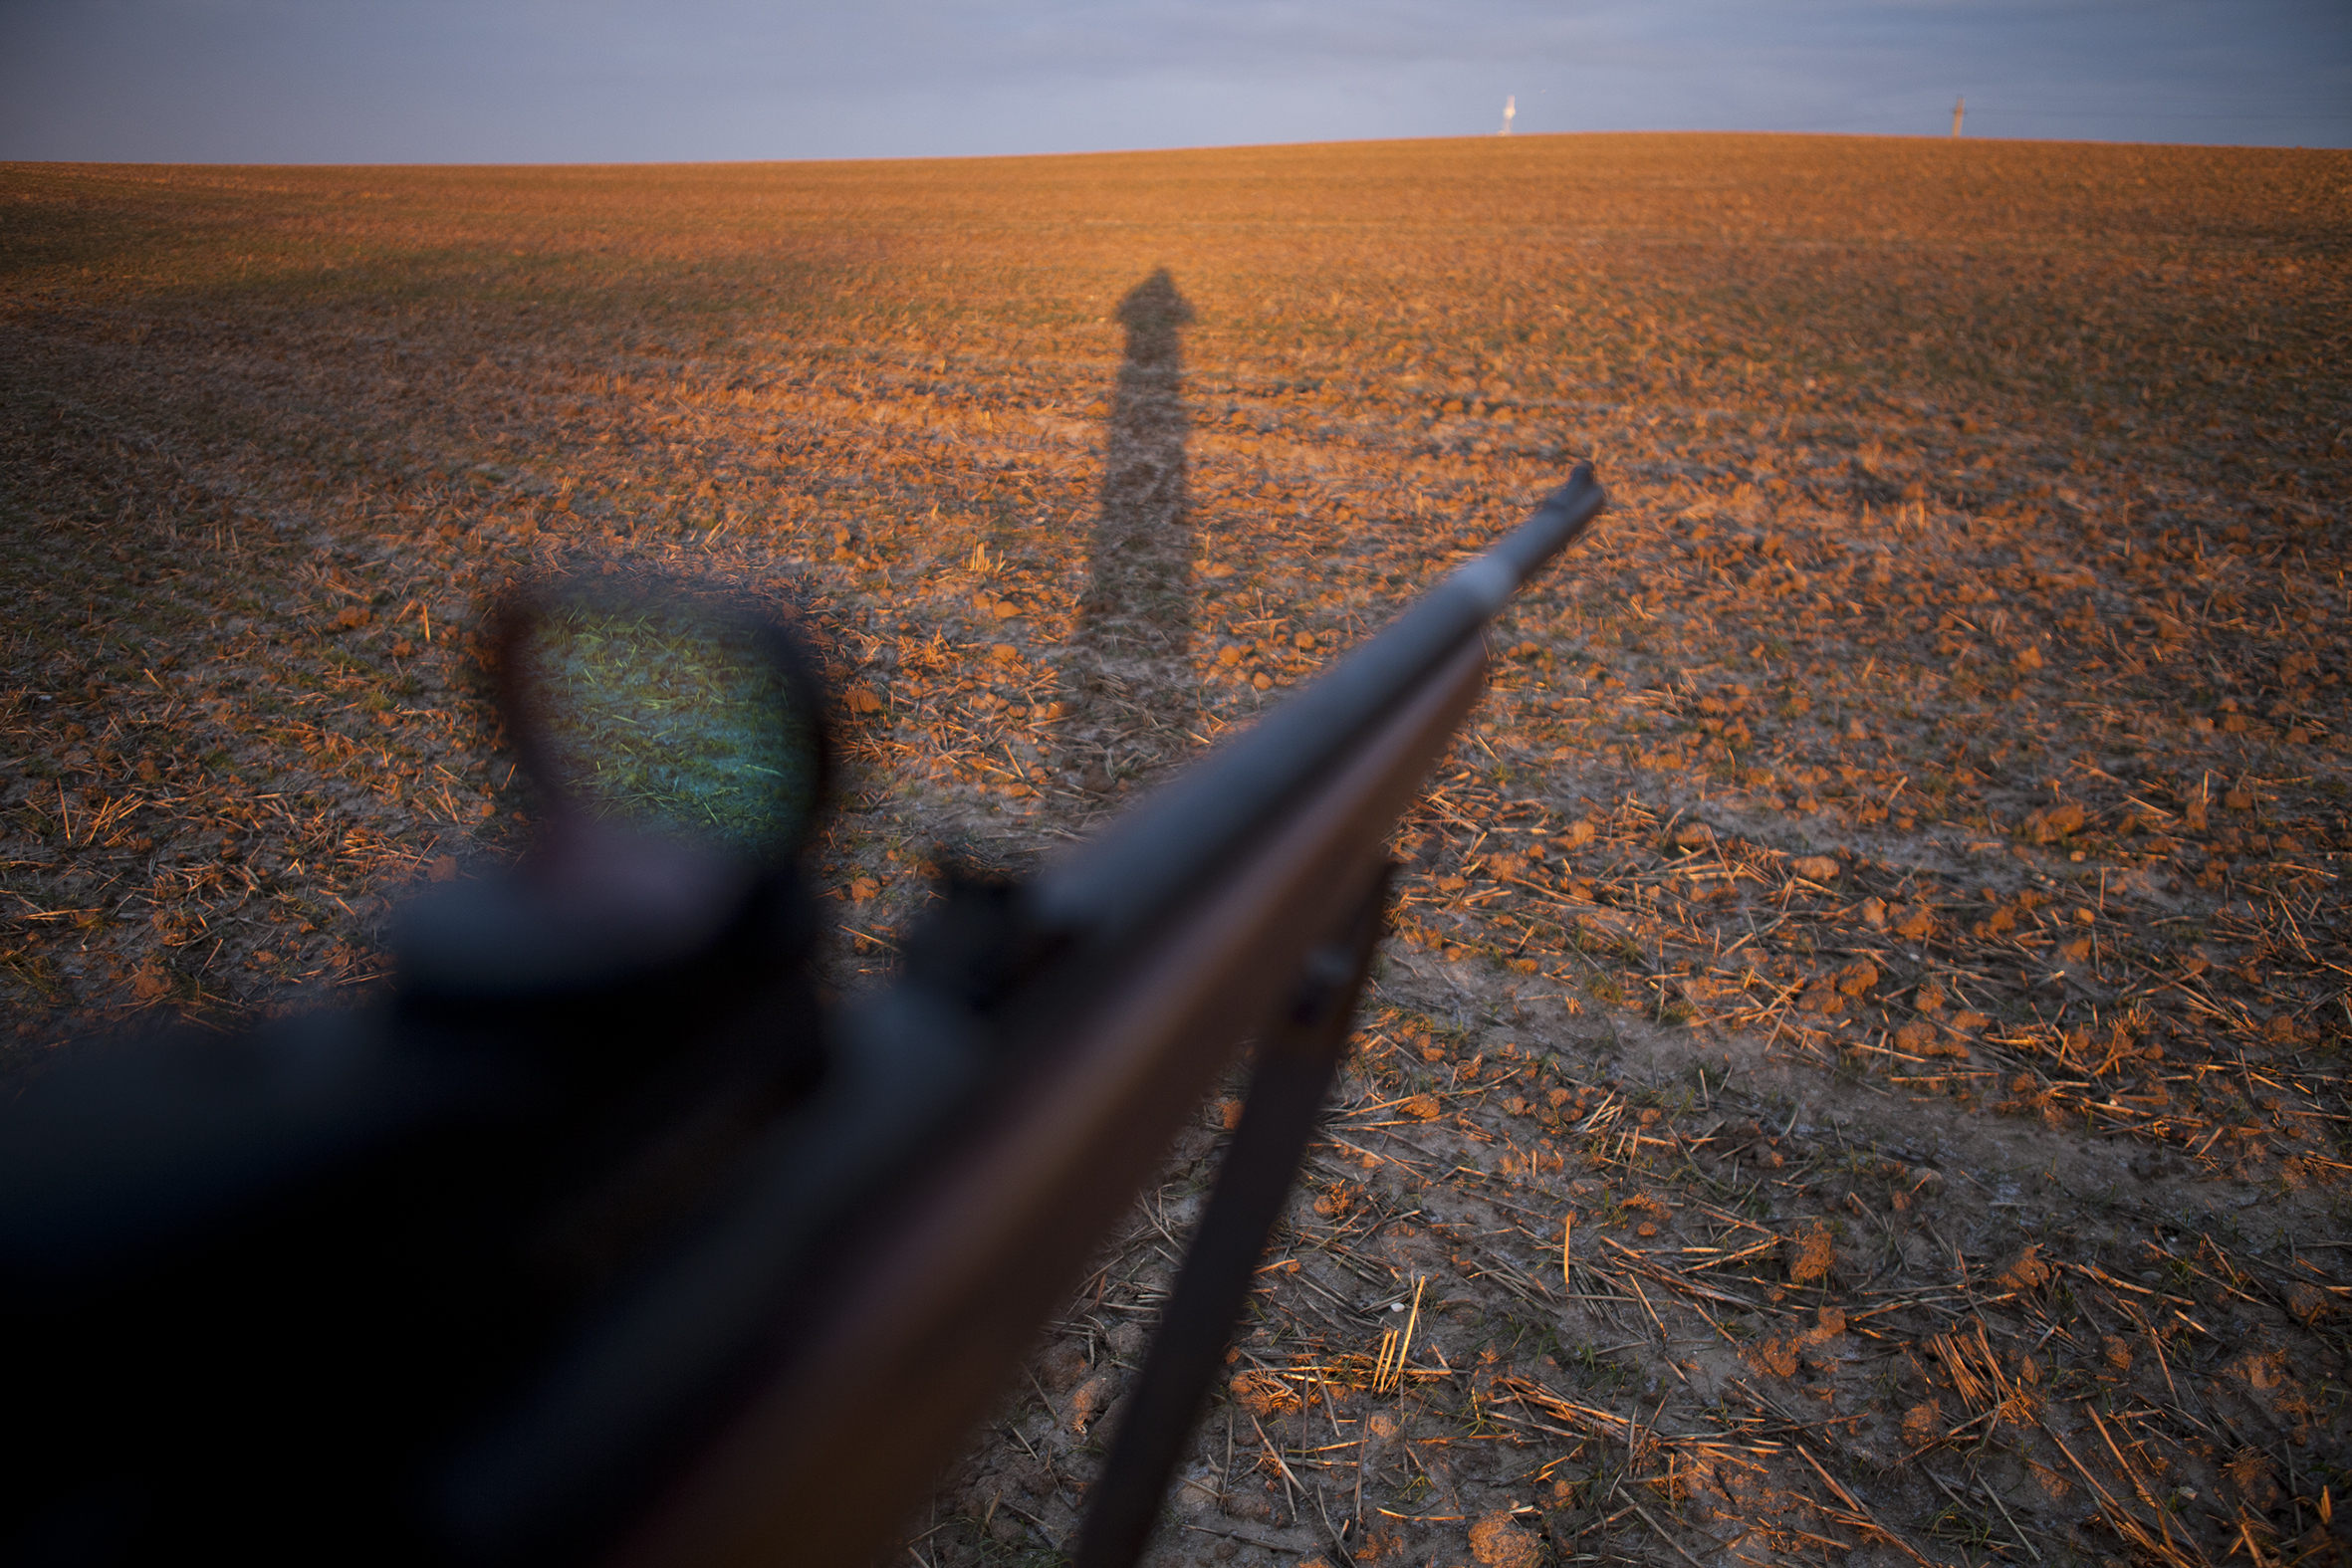 jagt.jpg